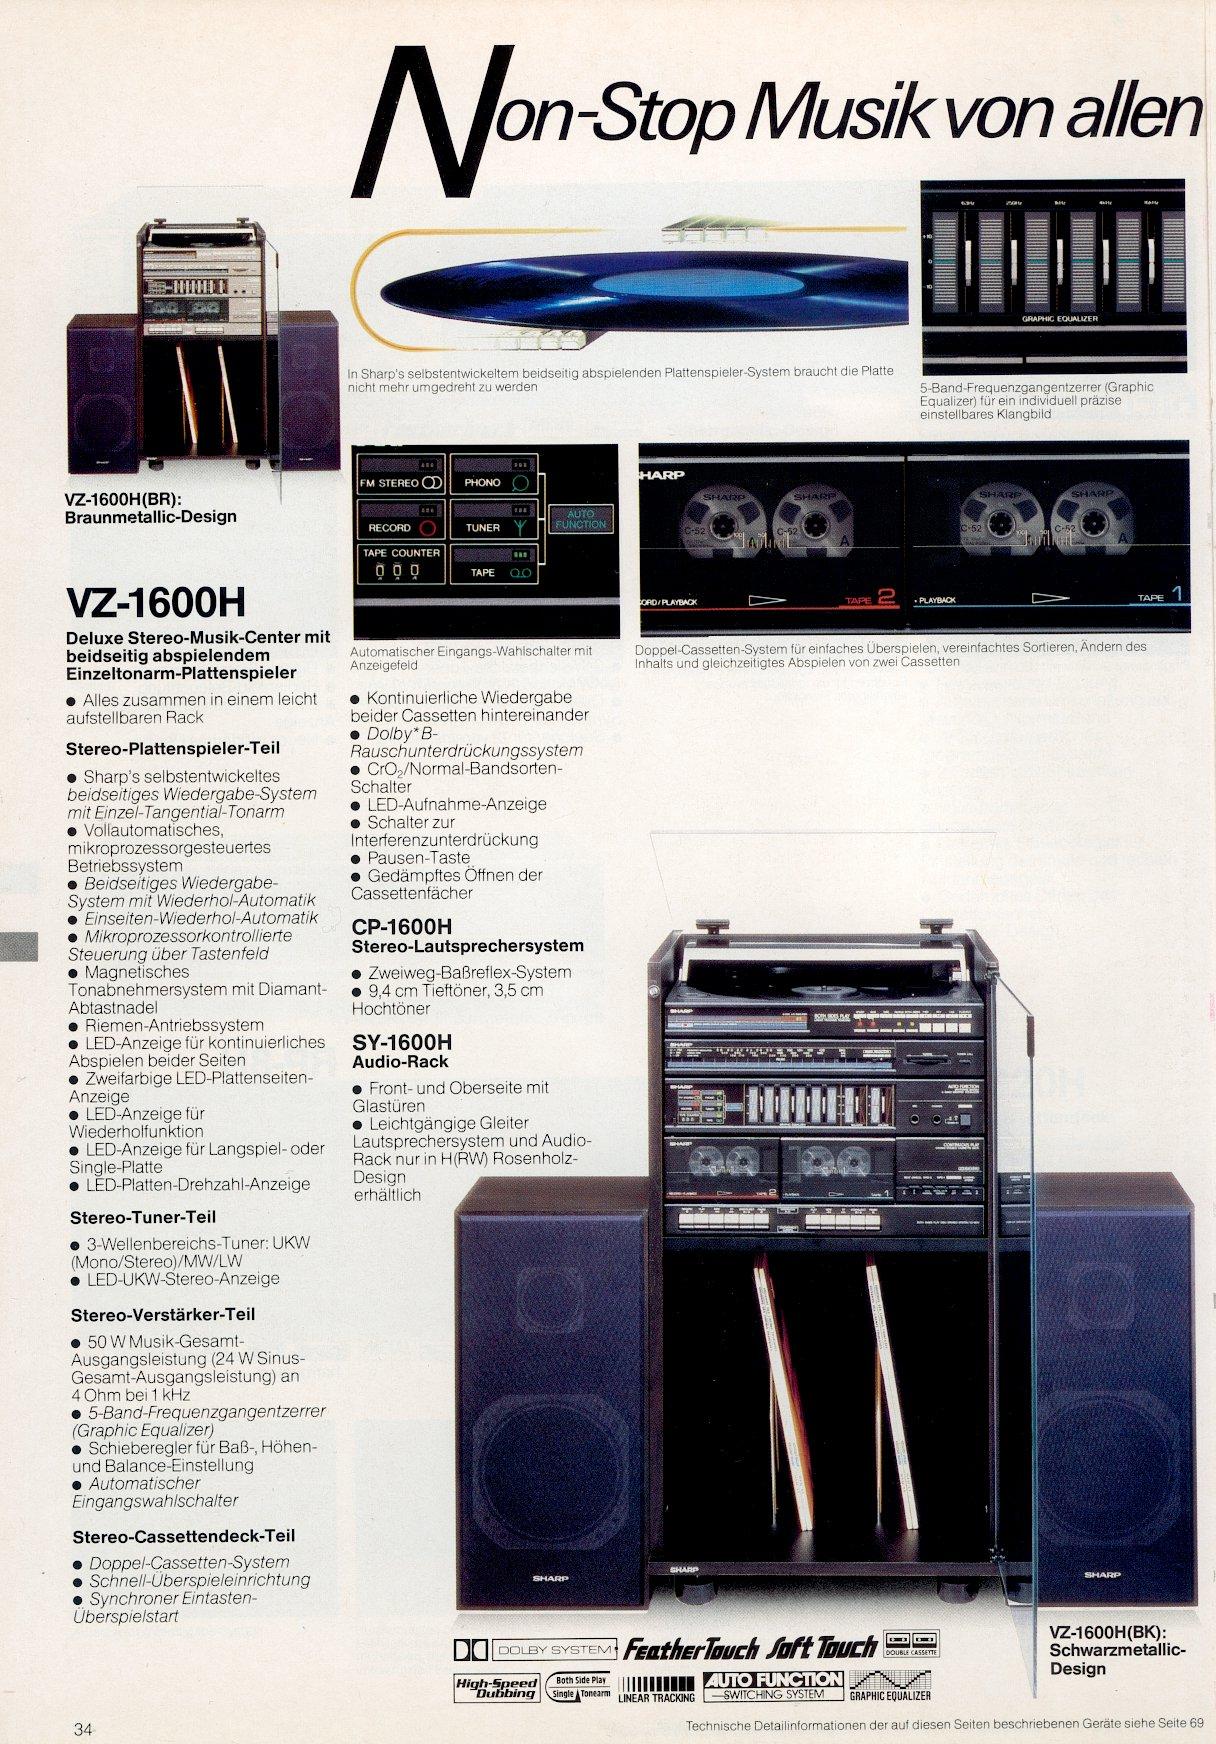 https://www.hifi-archiv.info/Sharp/1985-86%20Sharp%20Audio-TV-Video/1985-32.jpg